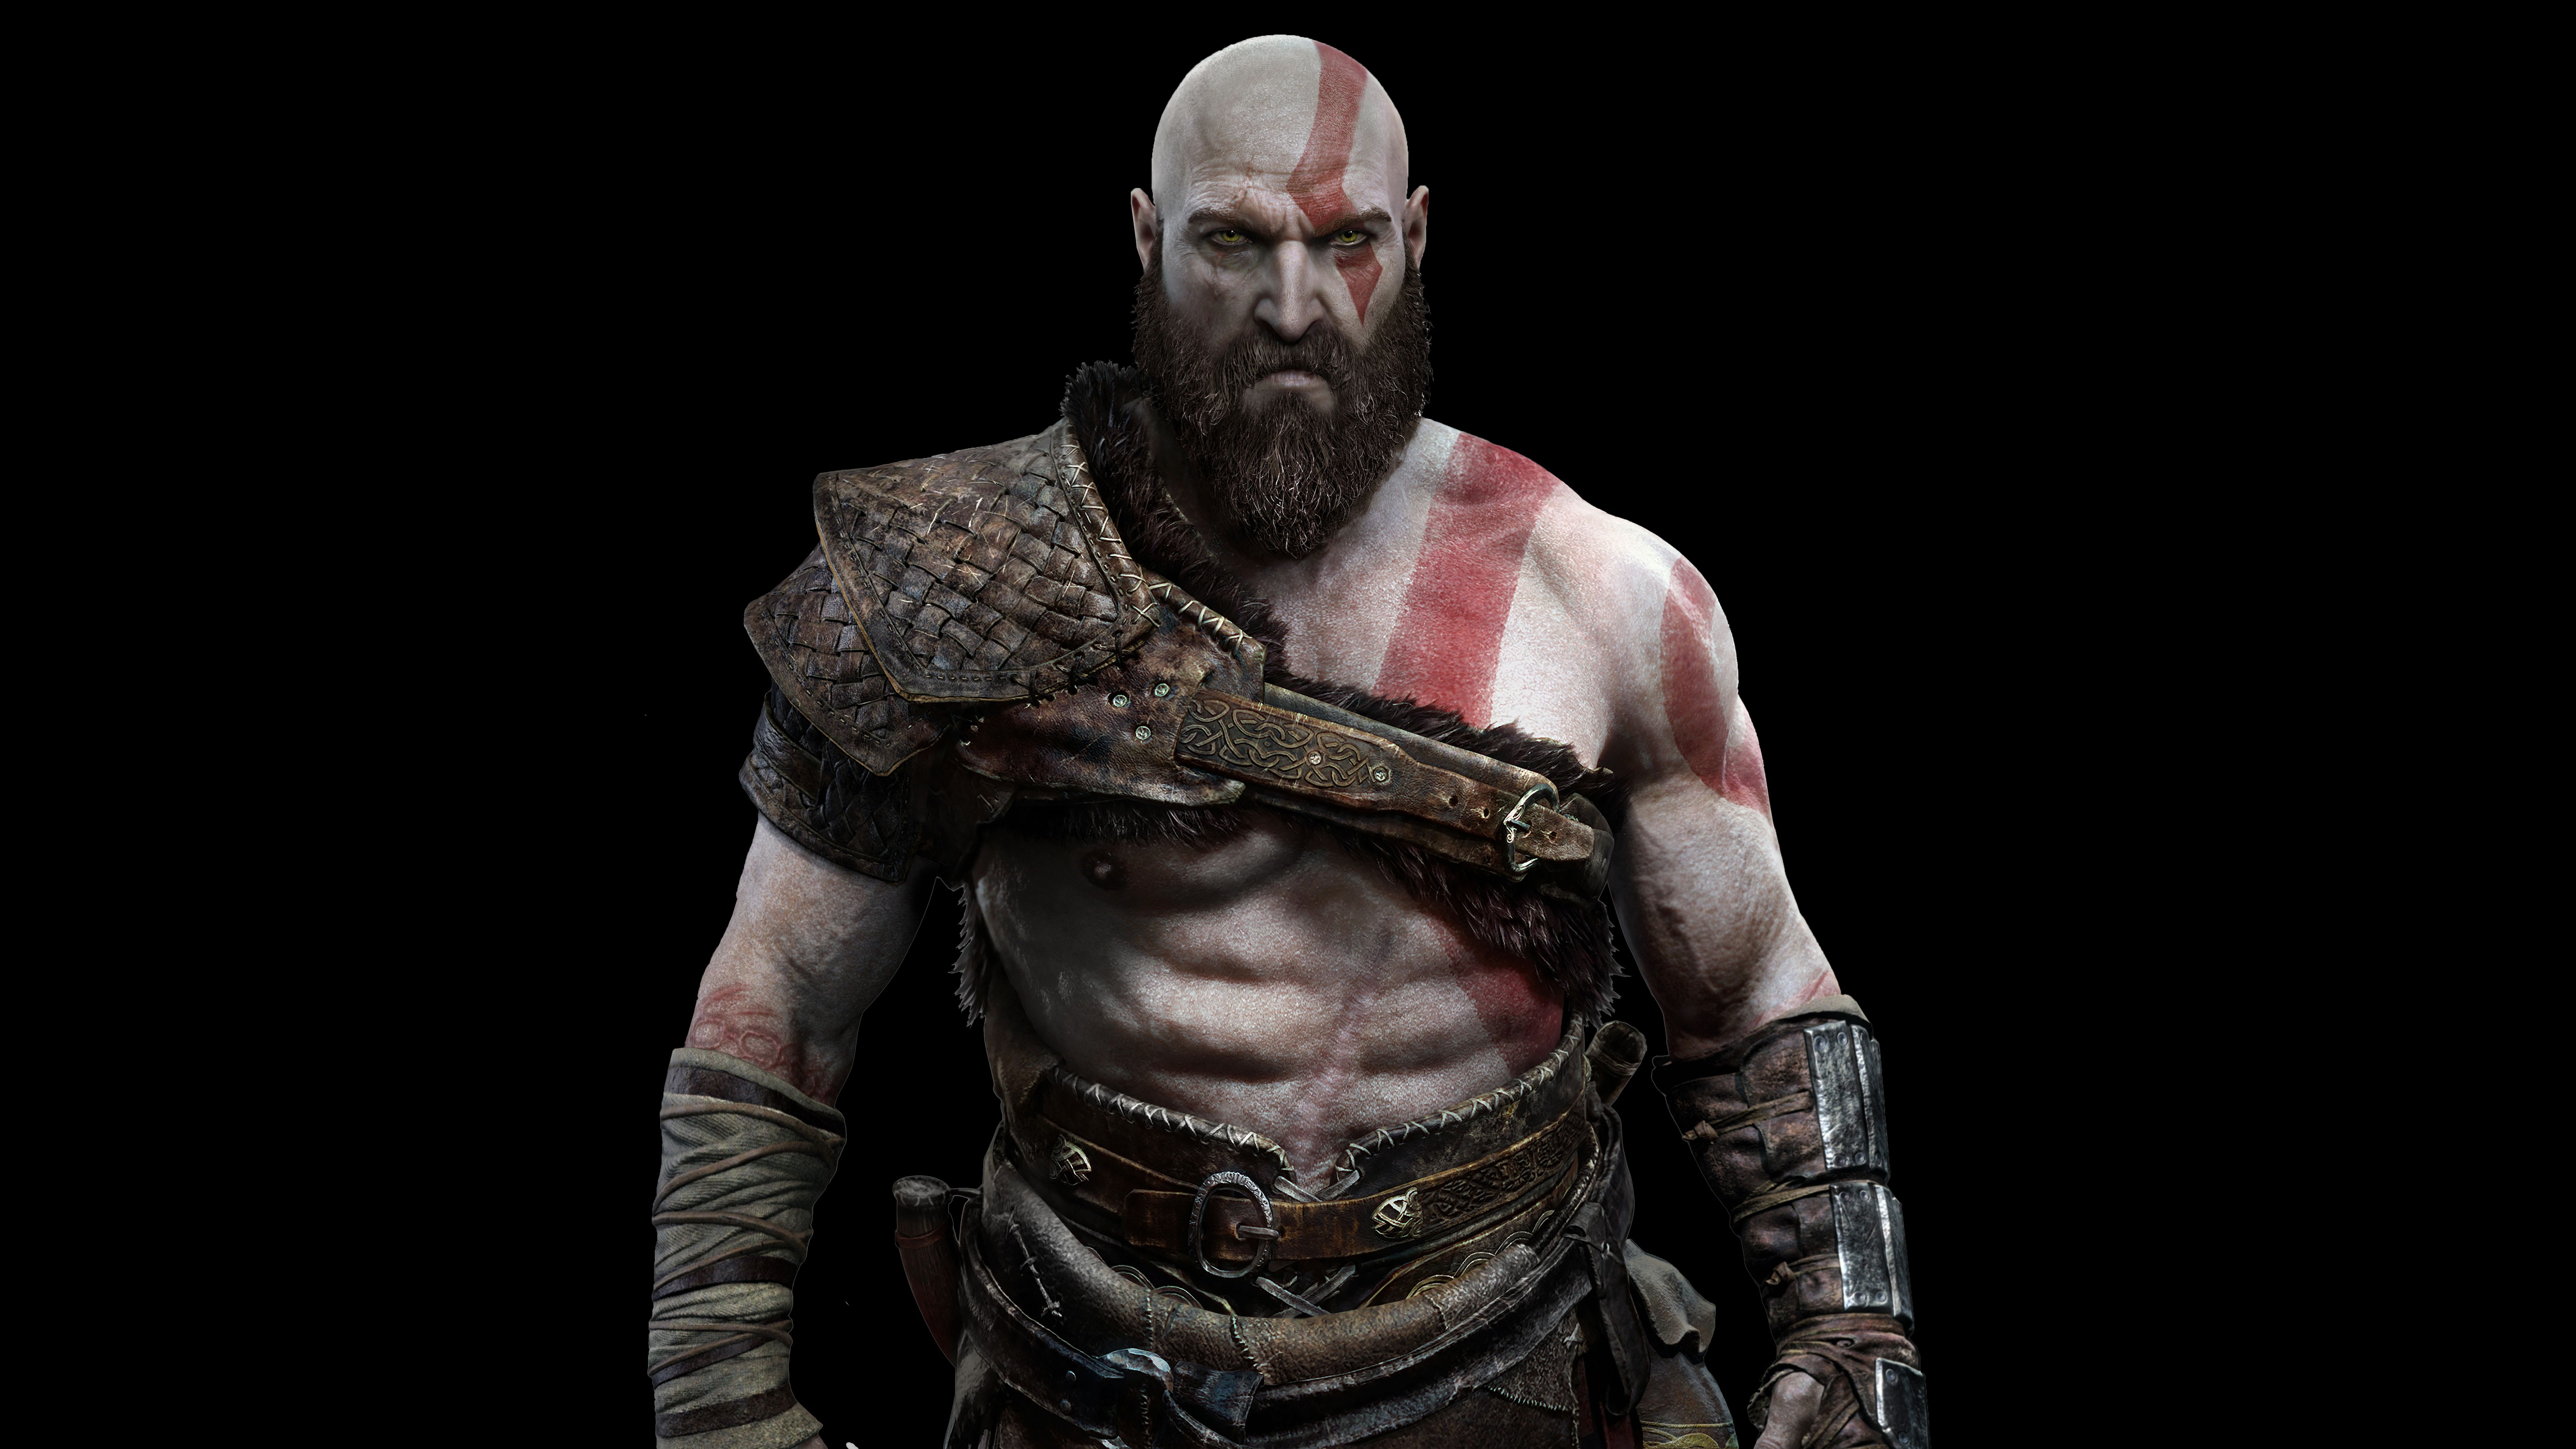 God Of War Kratos Ps4 8k Game 7680x4320 Wallpaper God Of War